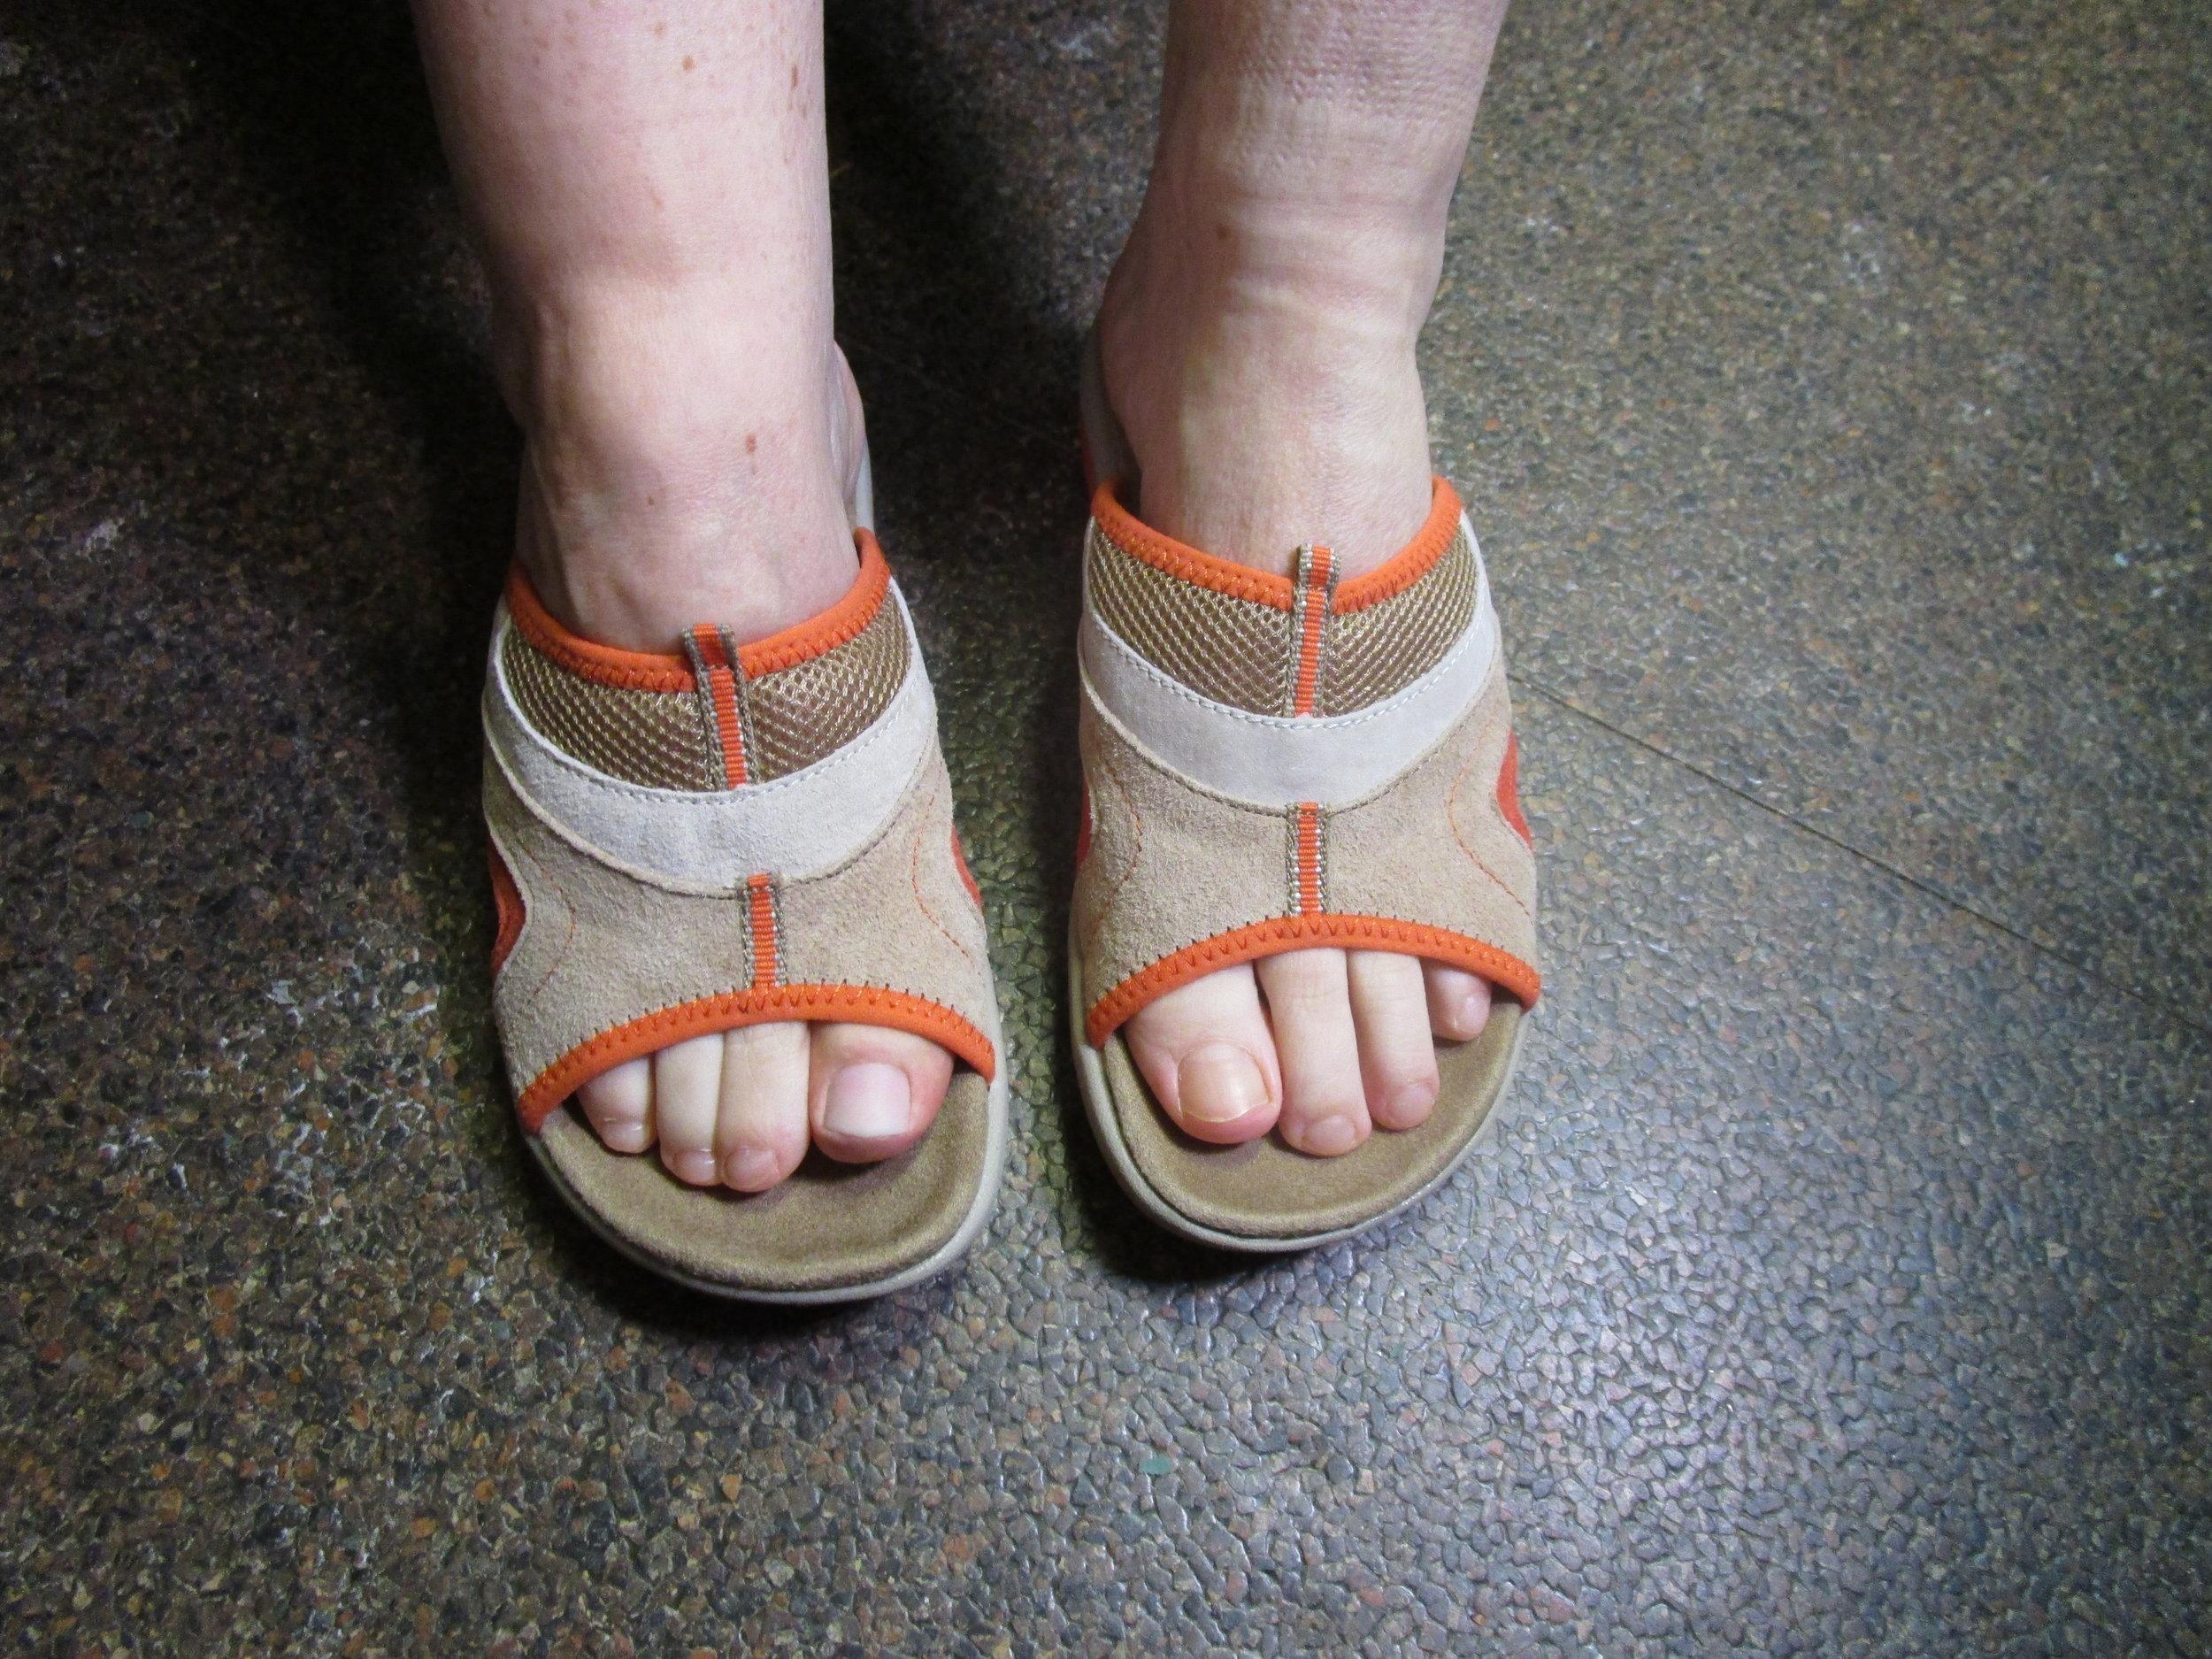 Big Toe Prosthesis on Patient